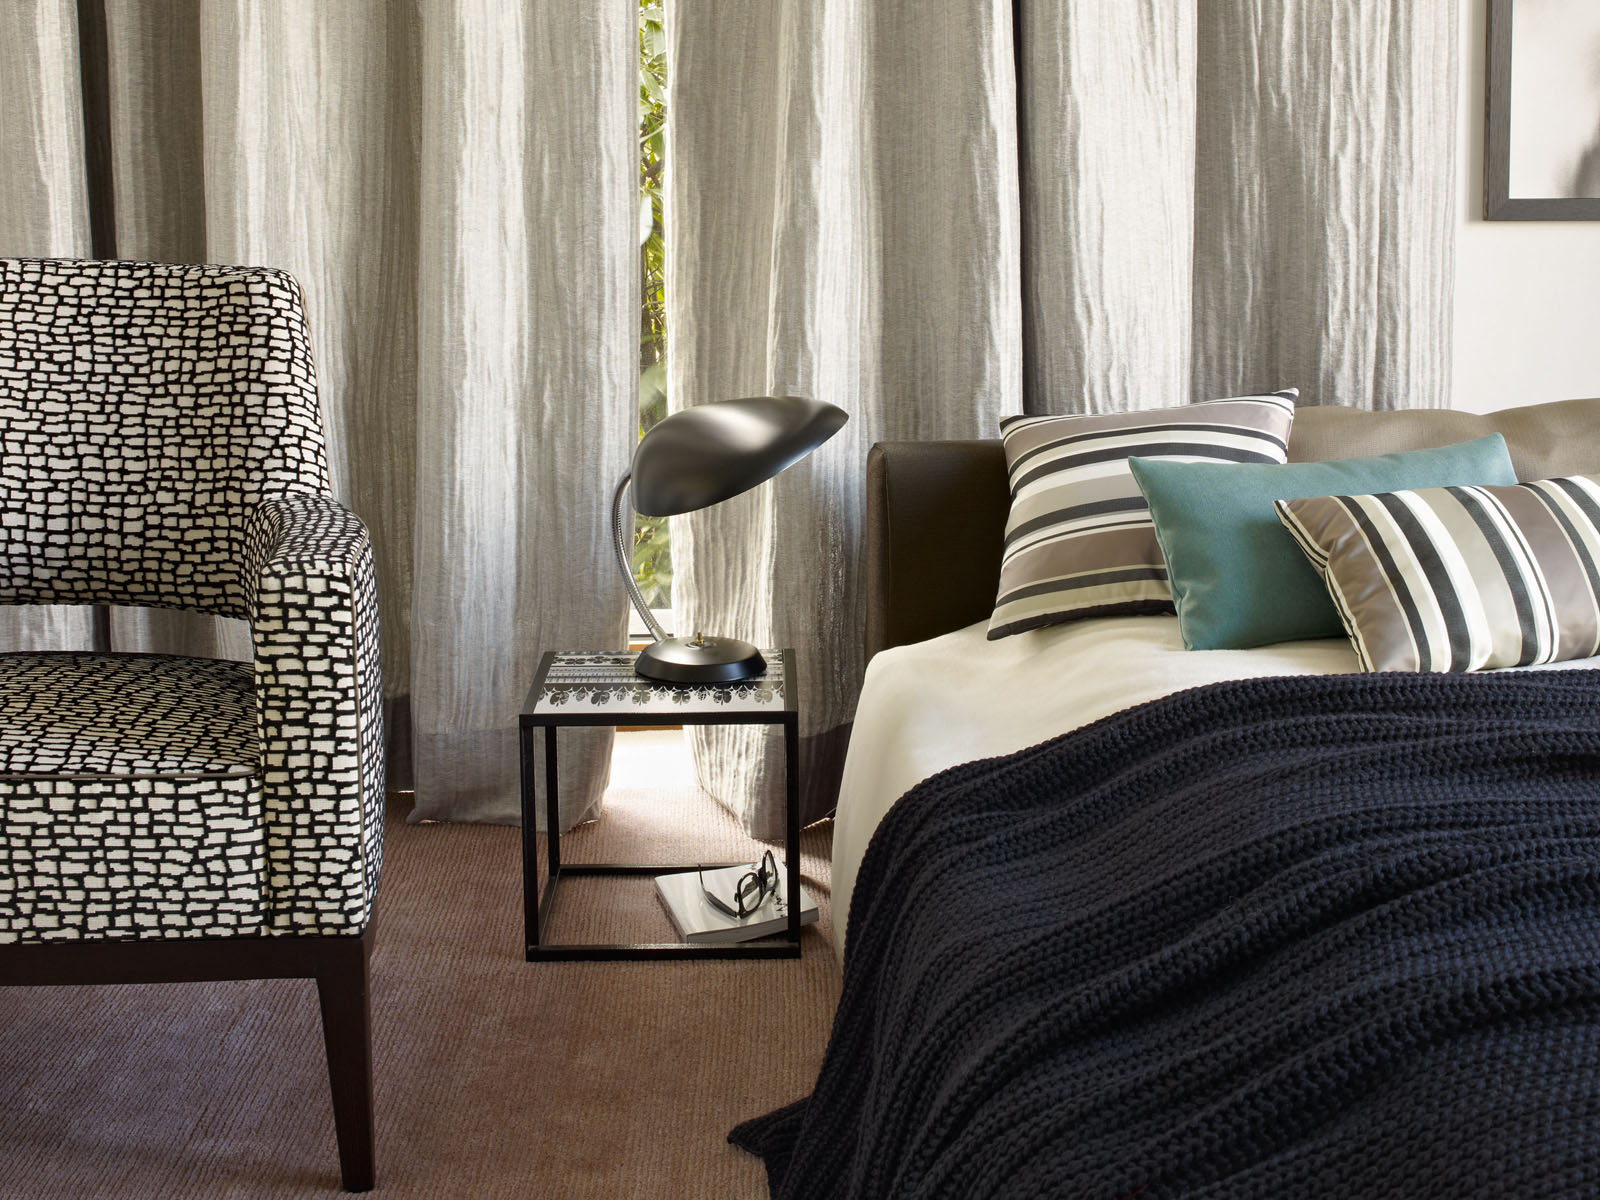 zimmer rhode designer fabric stockist london fabric company uk. Black Bedroom Furniture Sets. Home Design Ideas